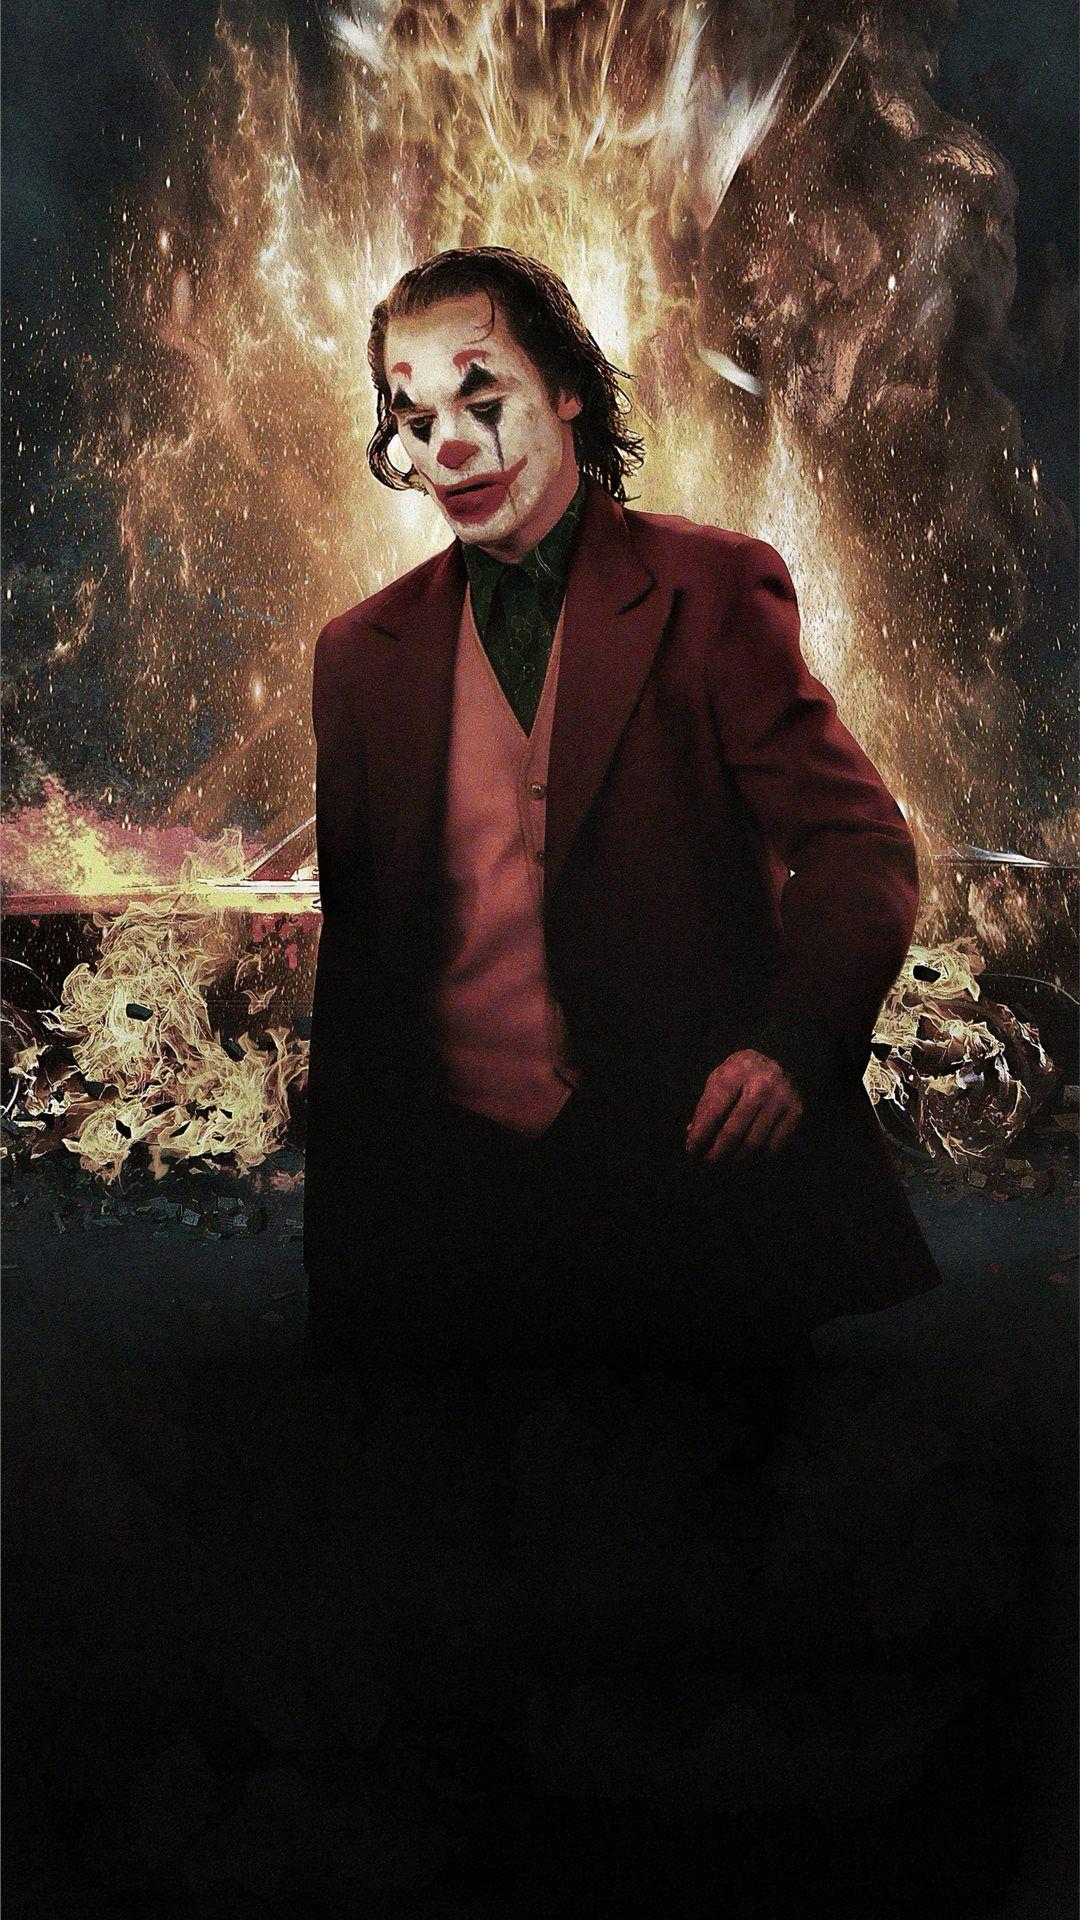 Free Download The Joker 2019 Movie 4k New Wallpaper Beaty Your Iphone Joker Movie Joker 2019 Movies M Joker 2019 Wallpaper Joker Hd Wallpaper Joker 2019